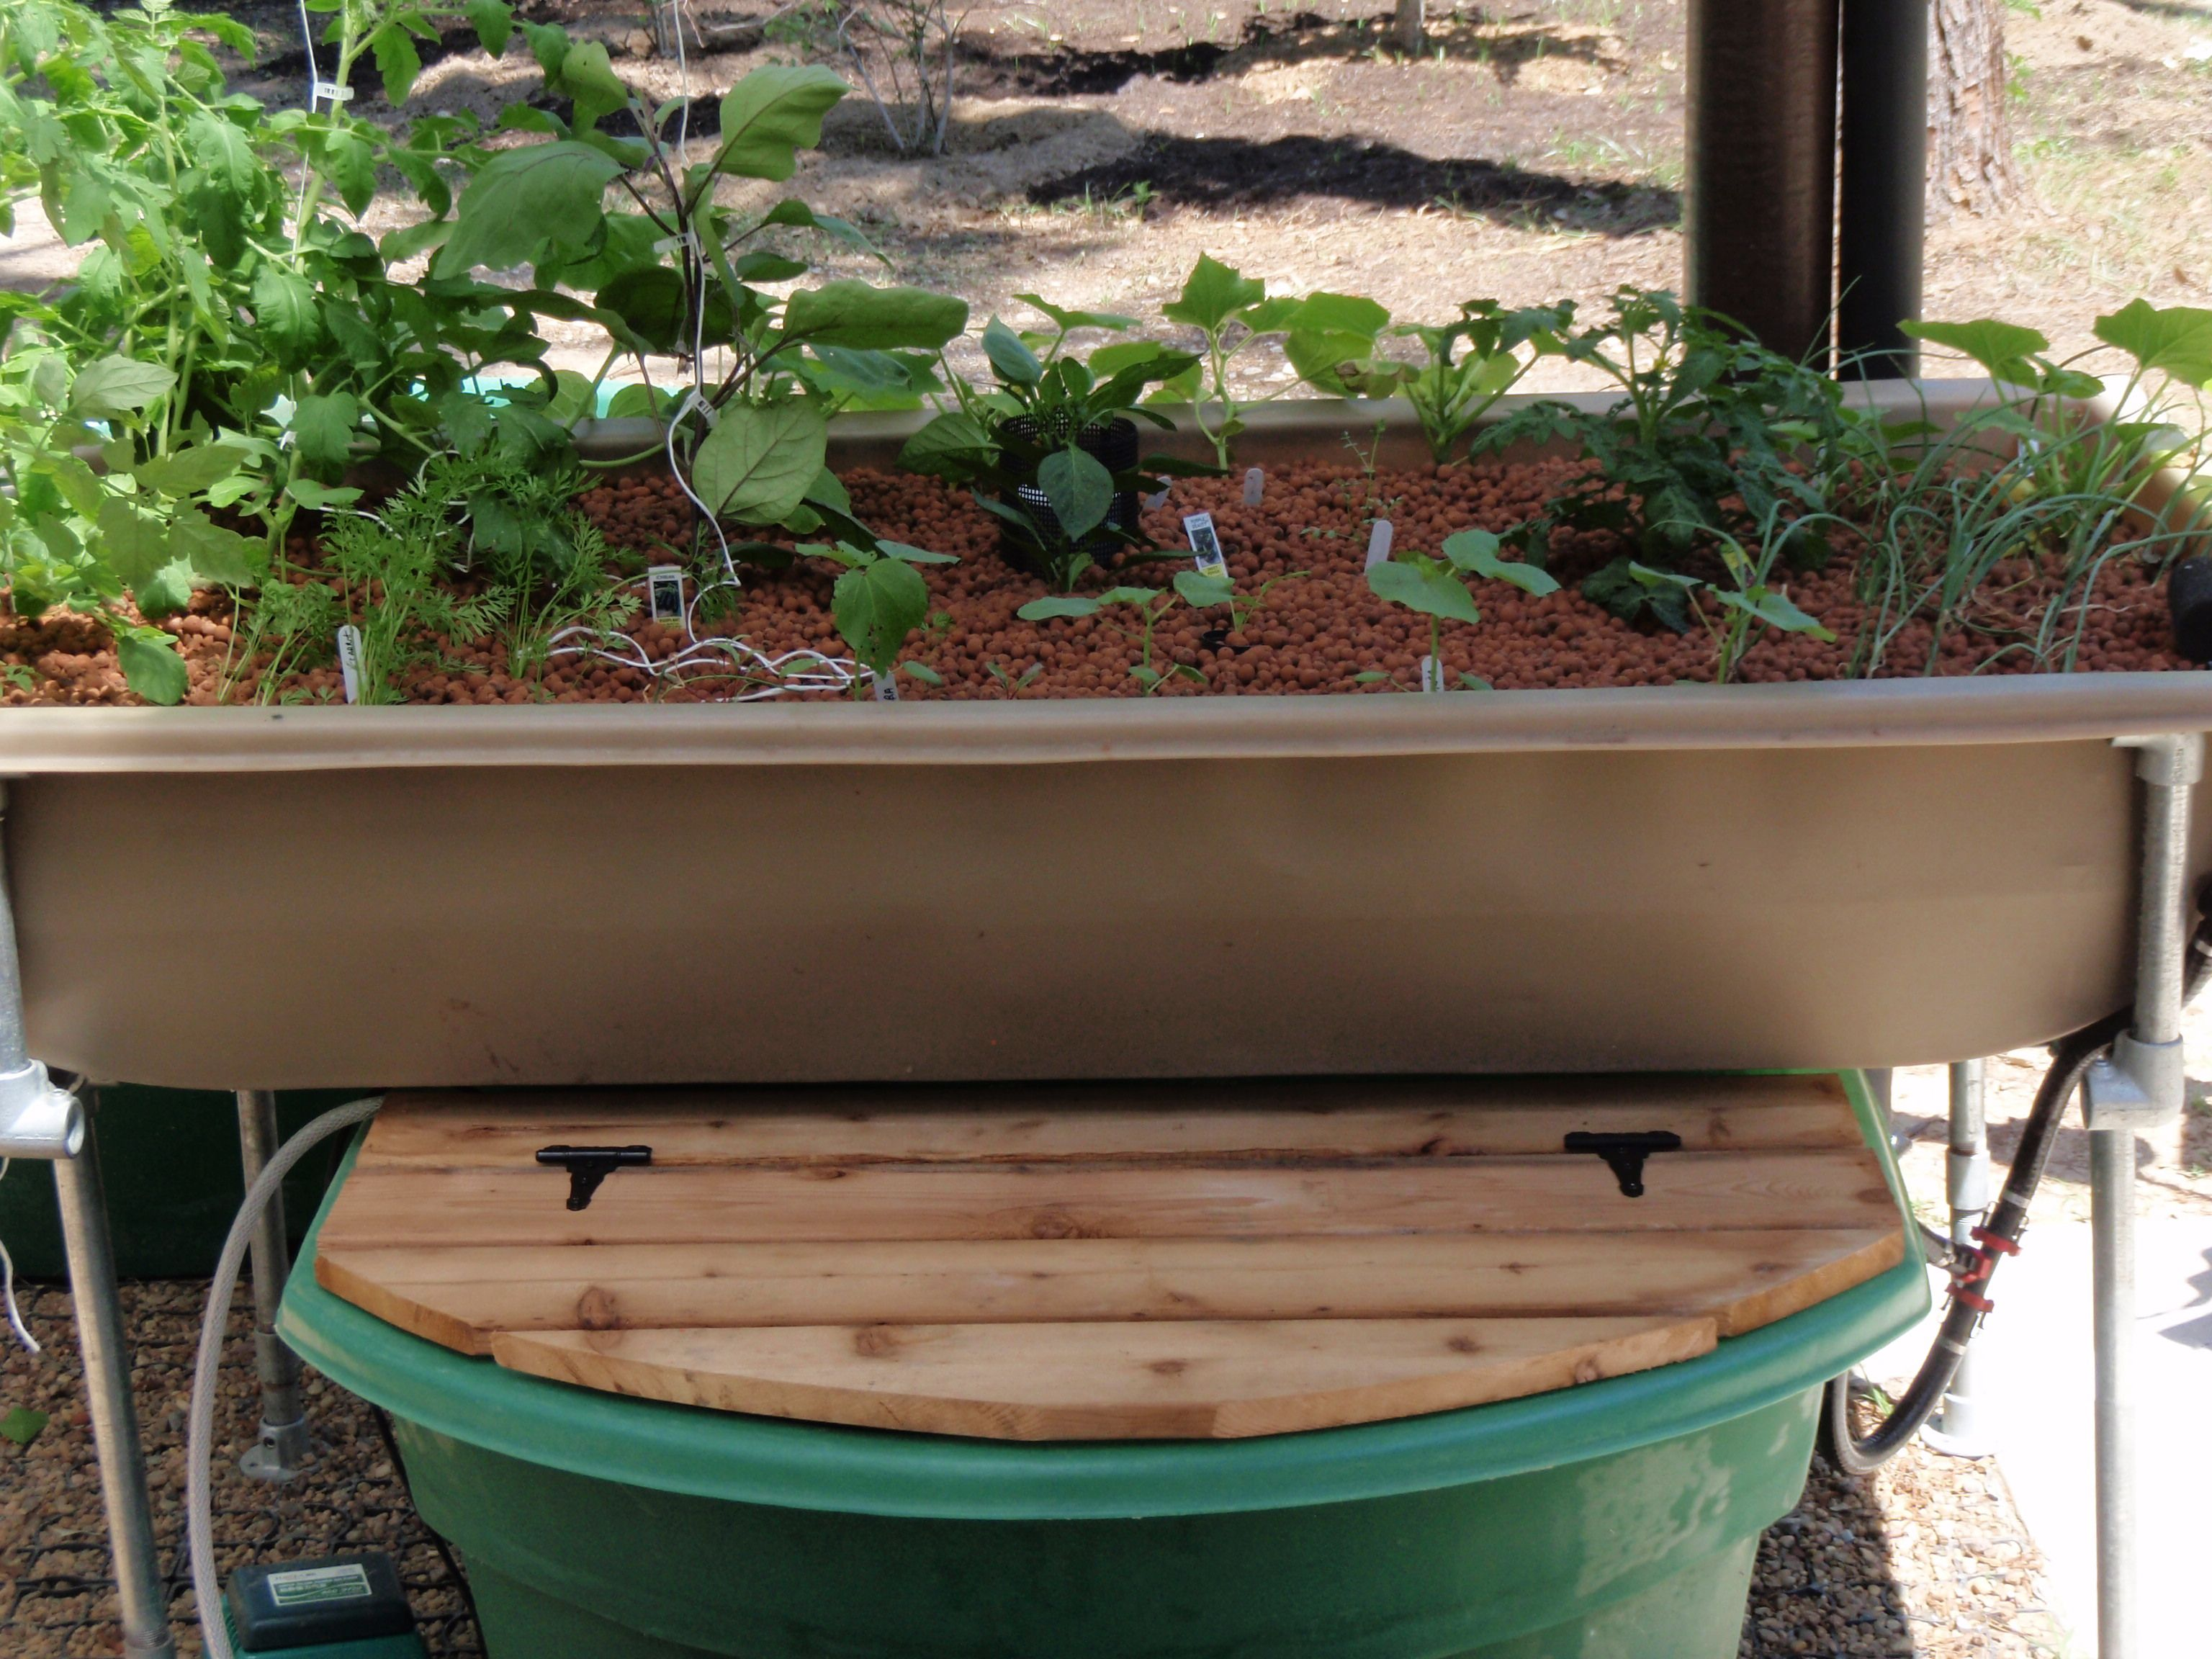 Greenlife Aquaponics Patio Garden Kit | Aquaponics Patio Garden Kit ...